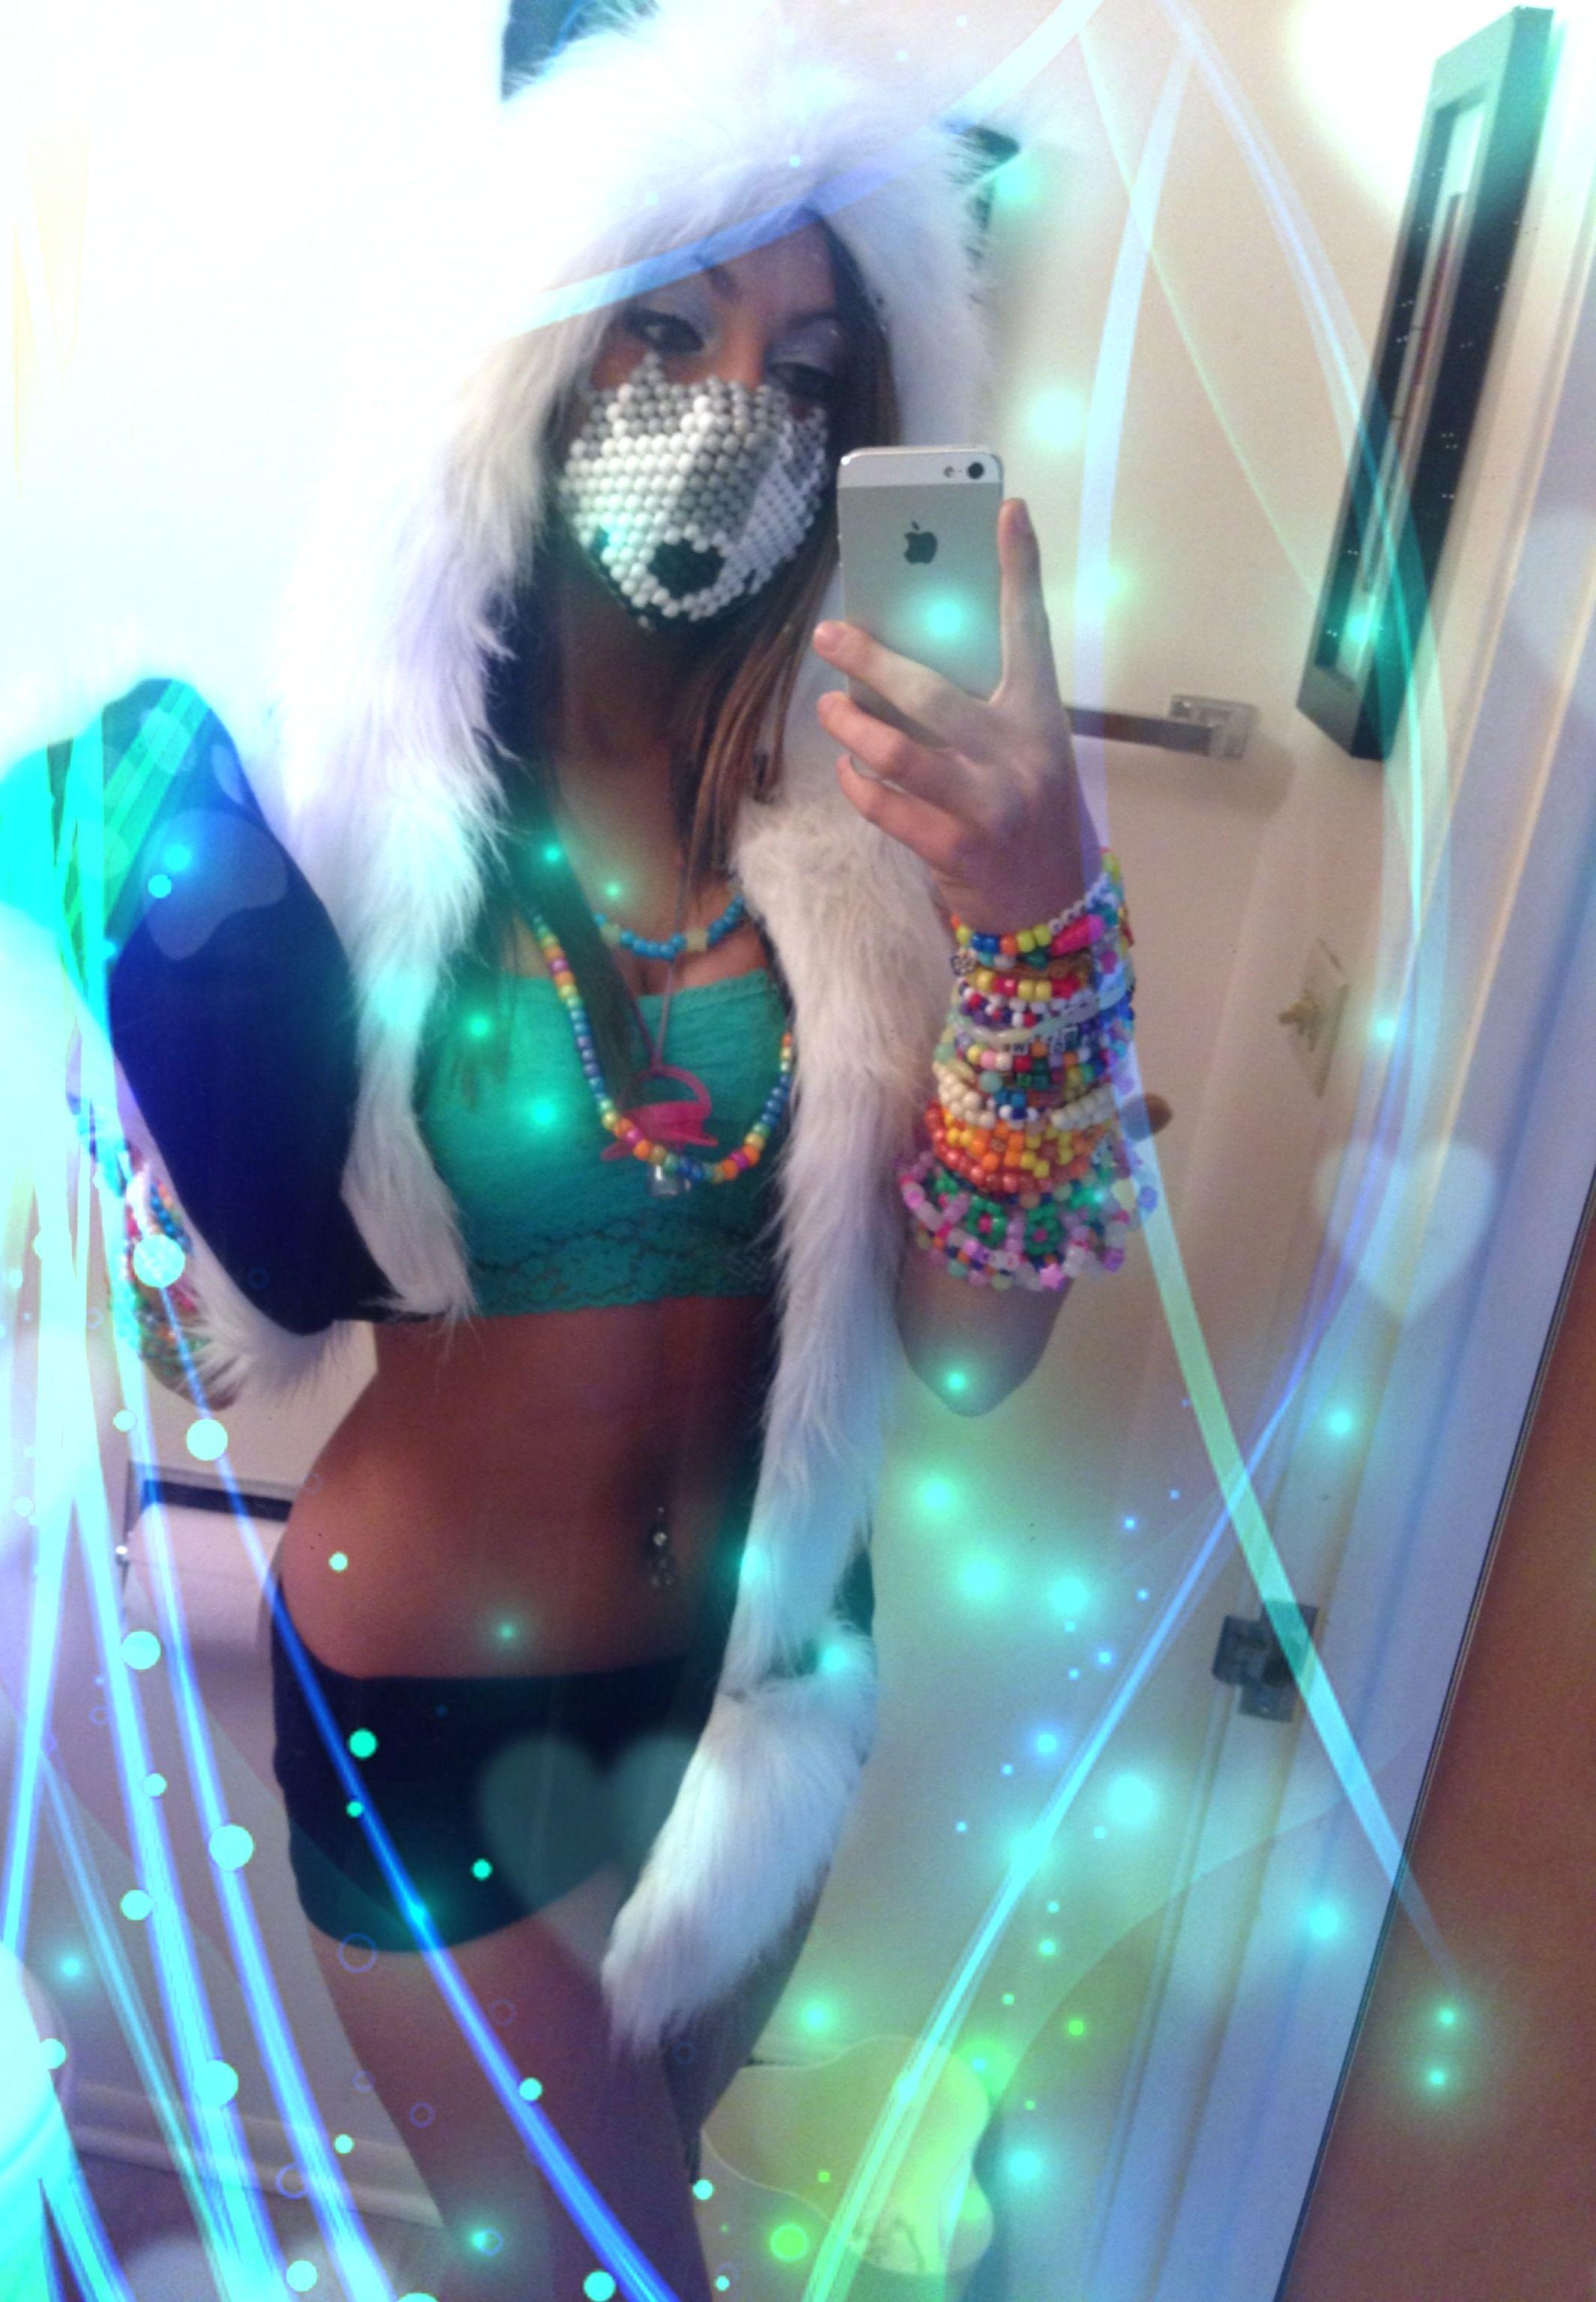 I Wanna Make My Mask This Year =]